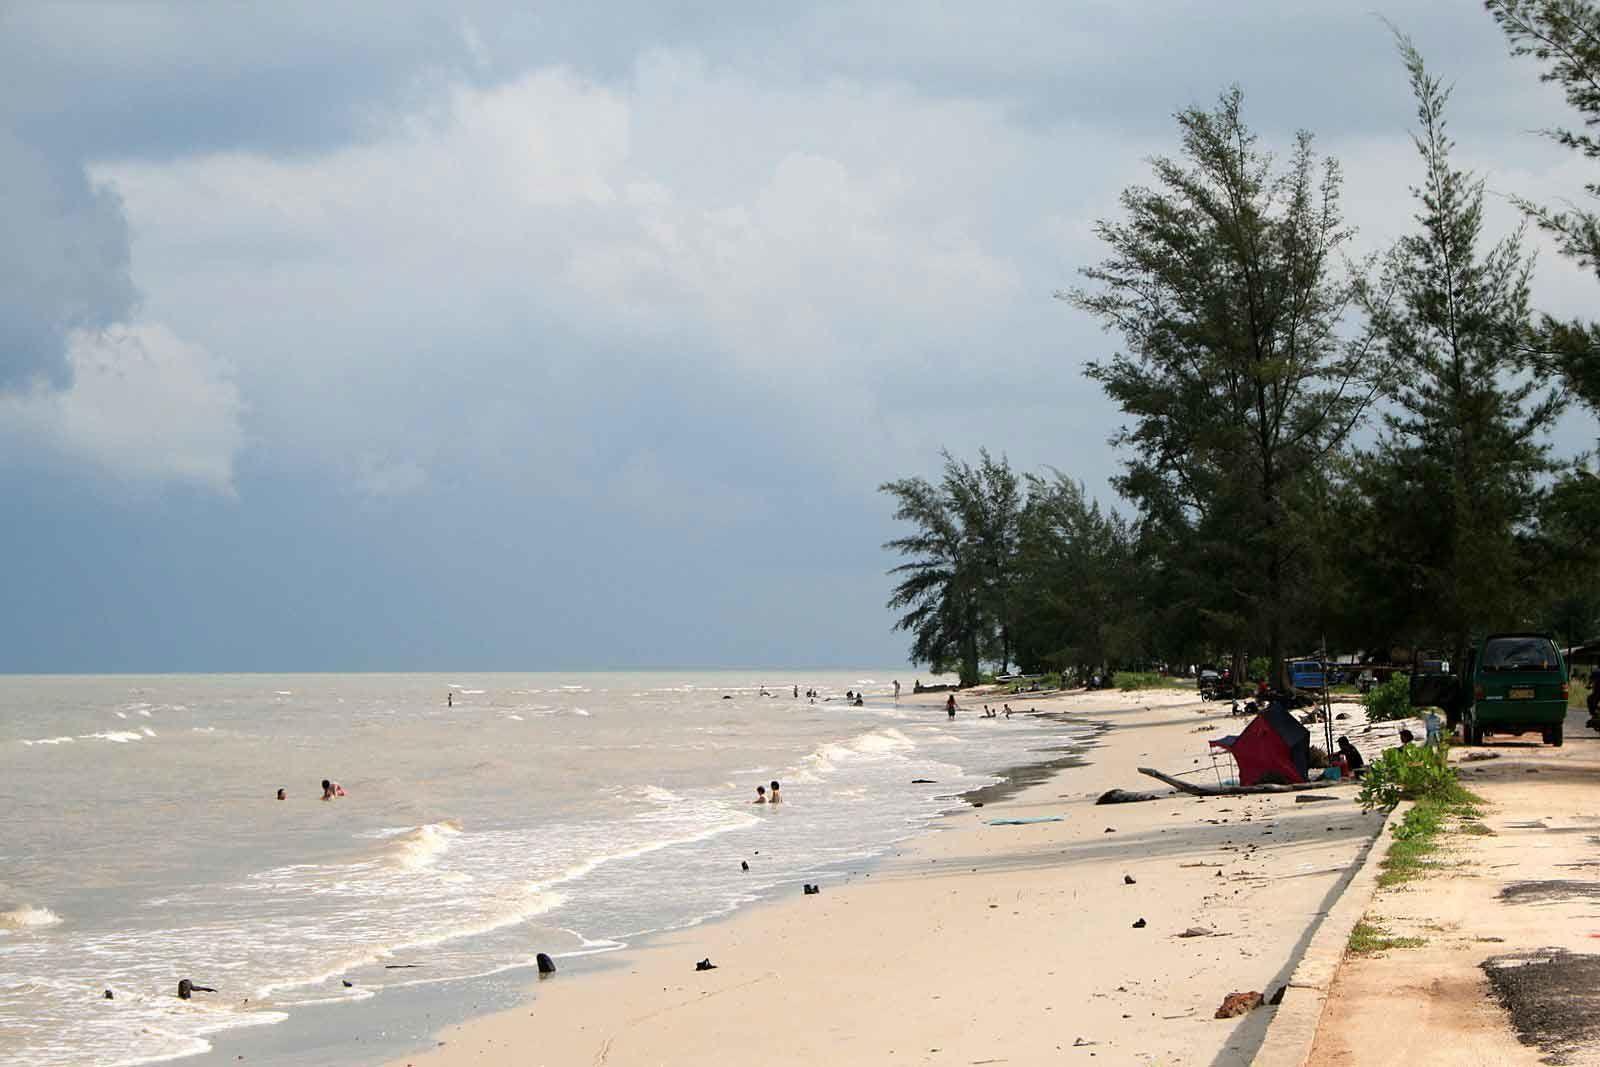 15 Kepingan Surga Kebumen Bikin Gak Sabar Pengin Liburan Pantai